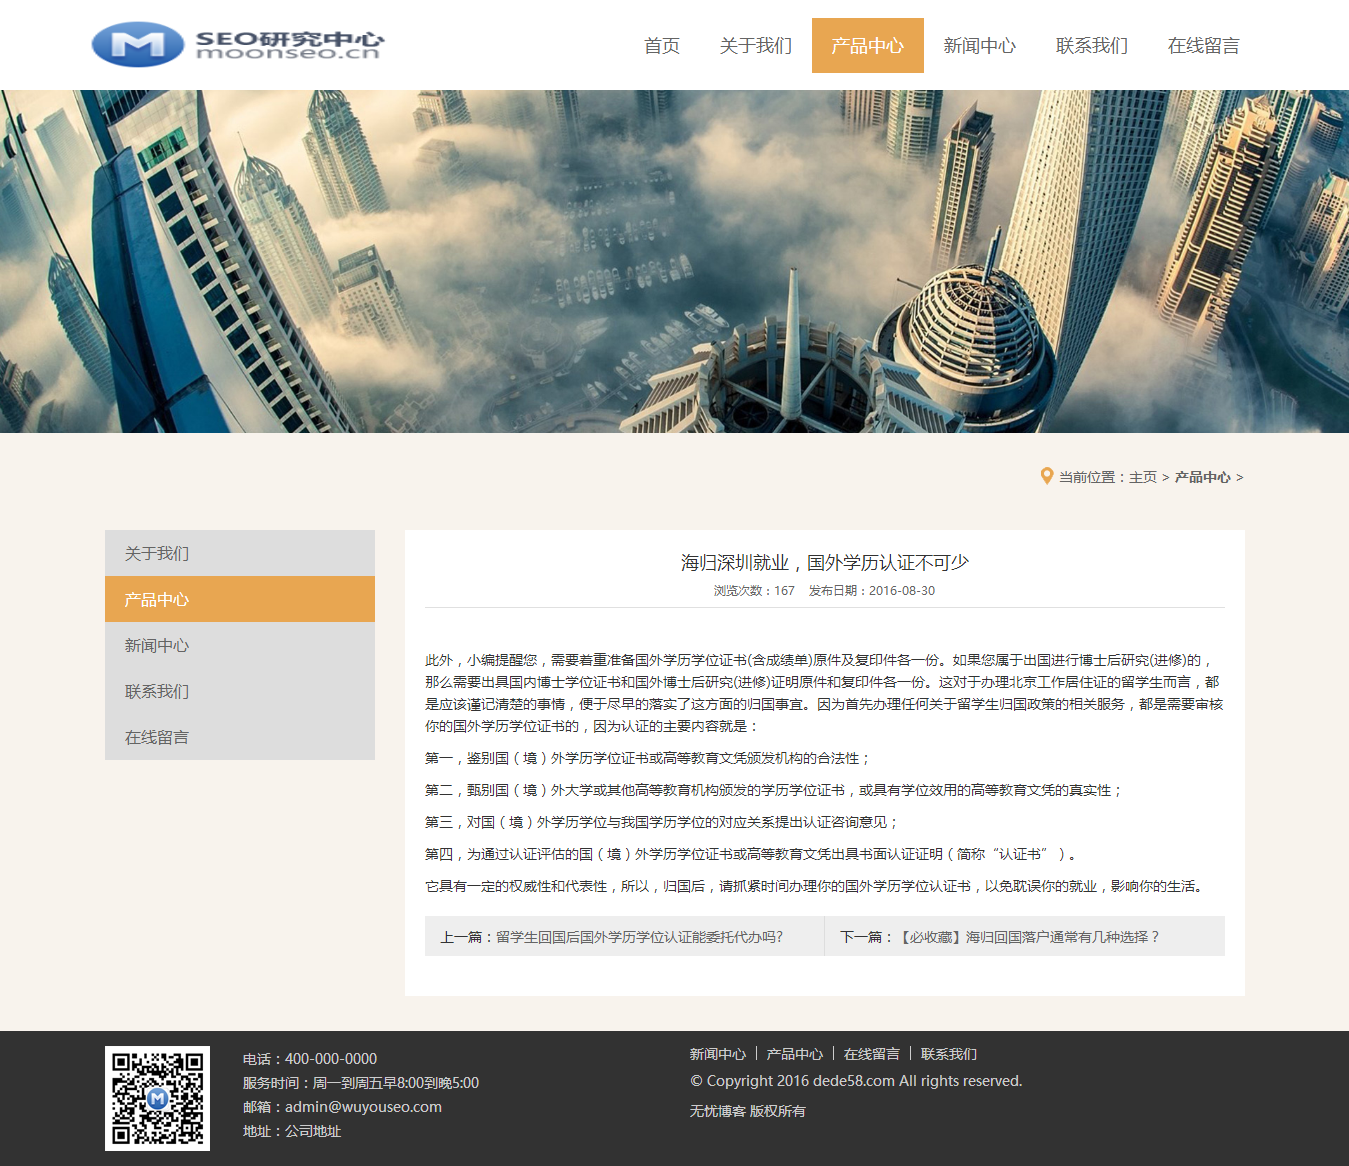 SEO研究中心-企业产品服务类模板